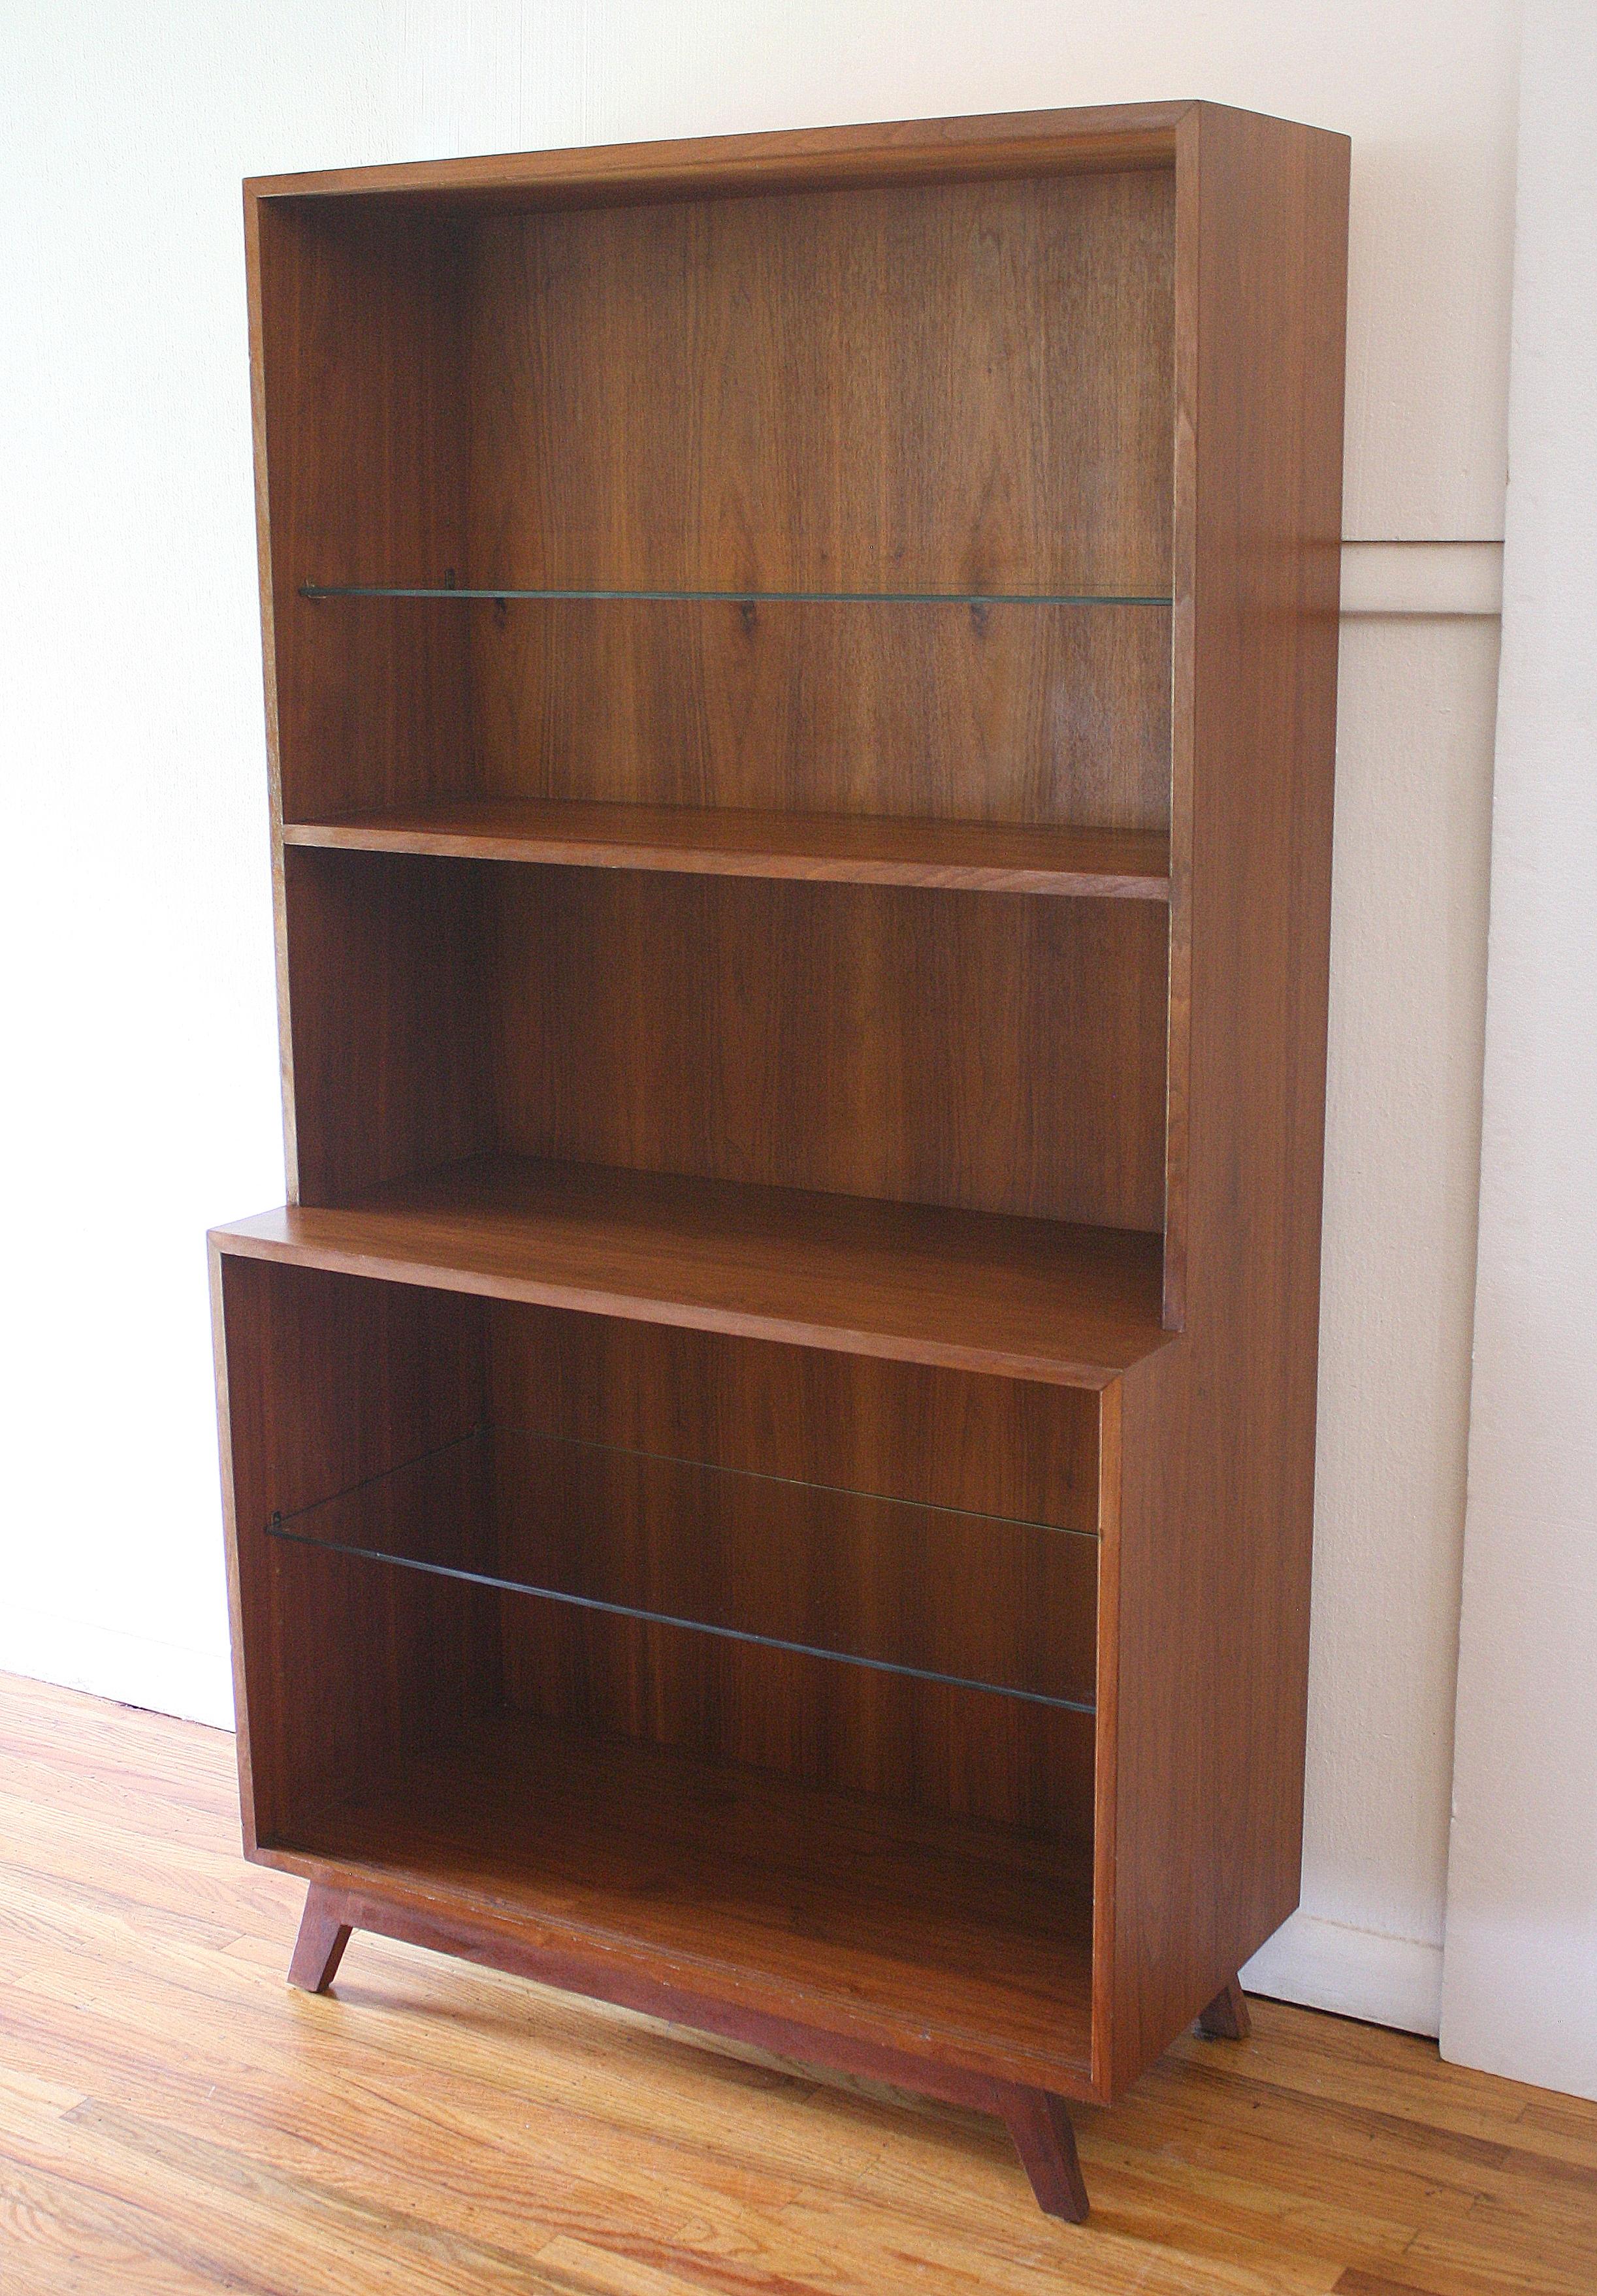 mcm sheving unit with adjustable shelves 1